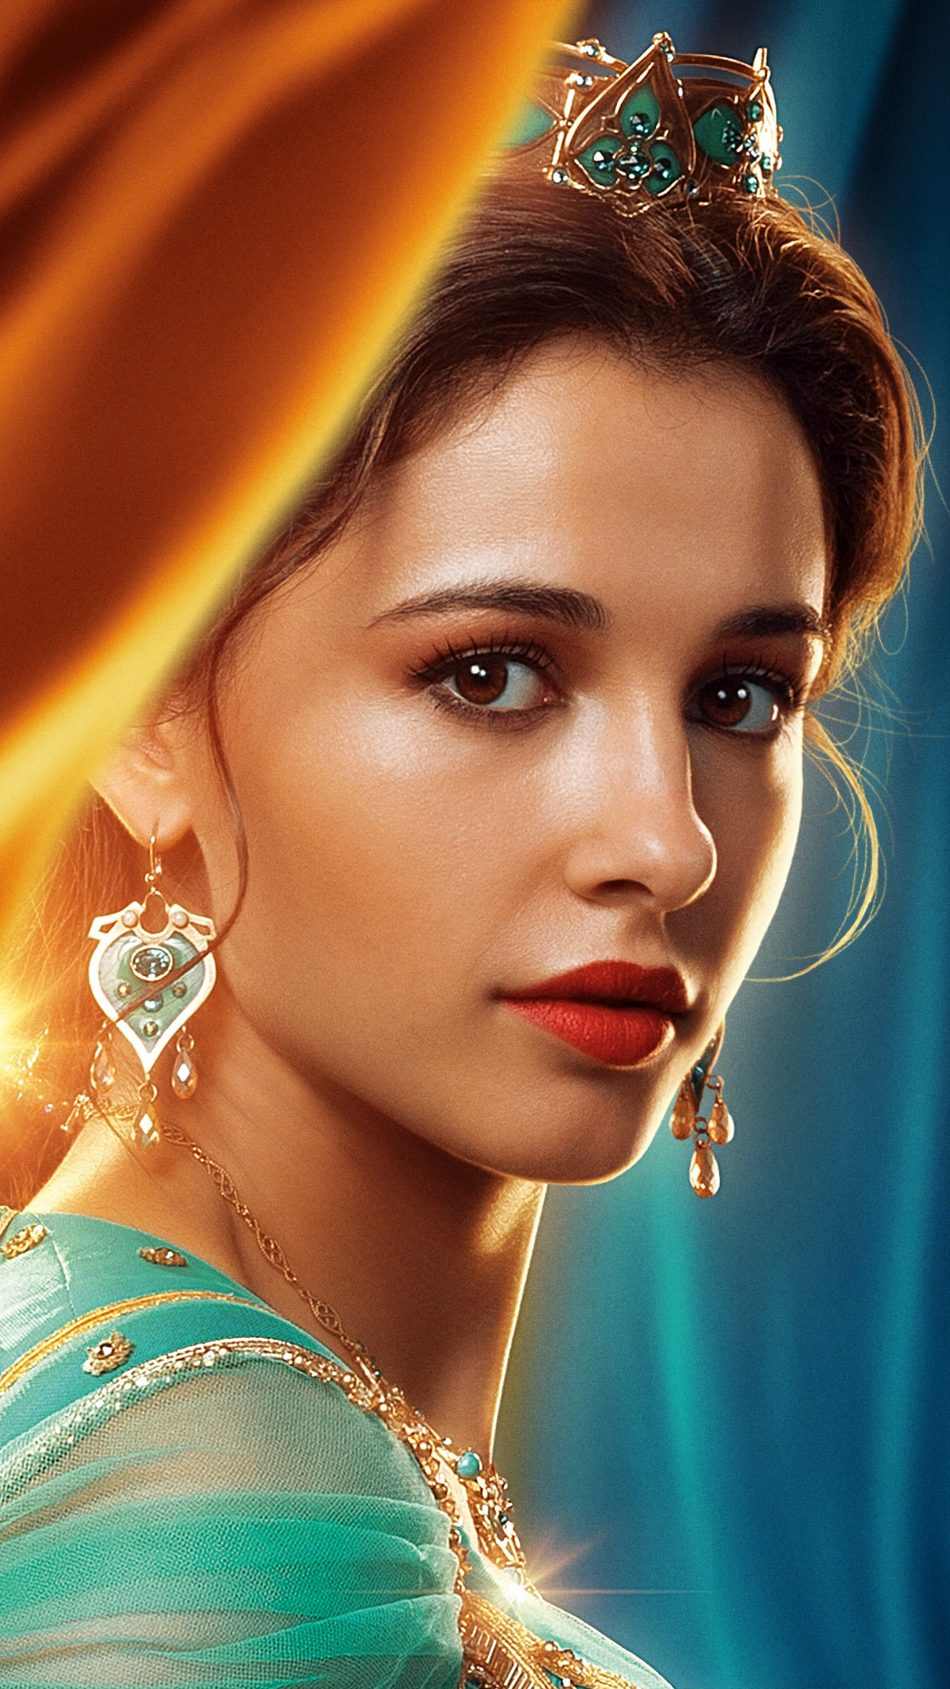 Princess Jasmine In Aladdin 2019 4K Ultra HD Mobile Wallpaper